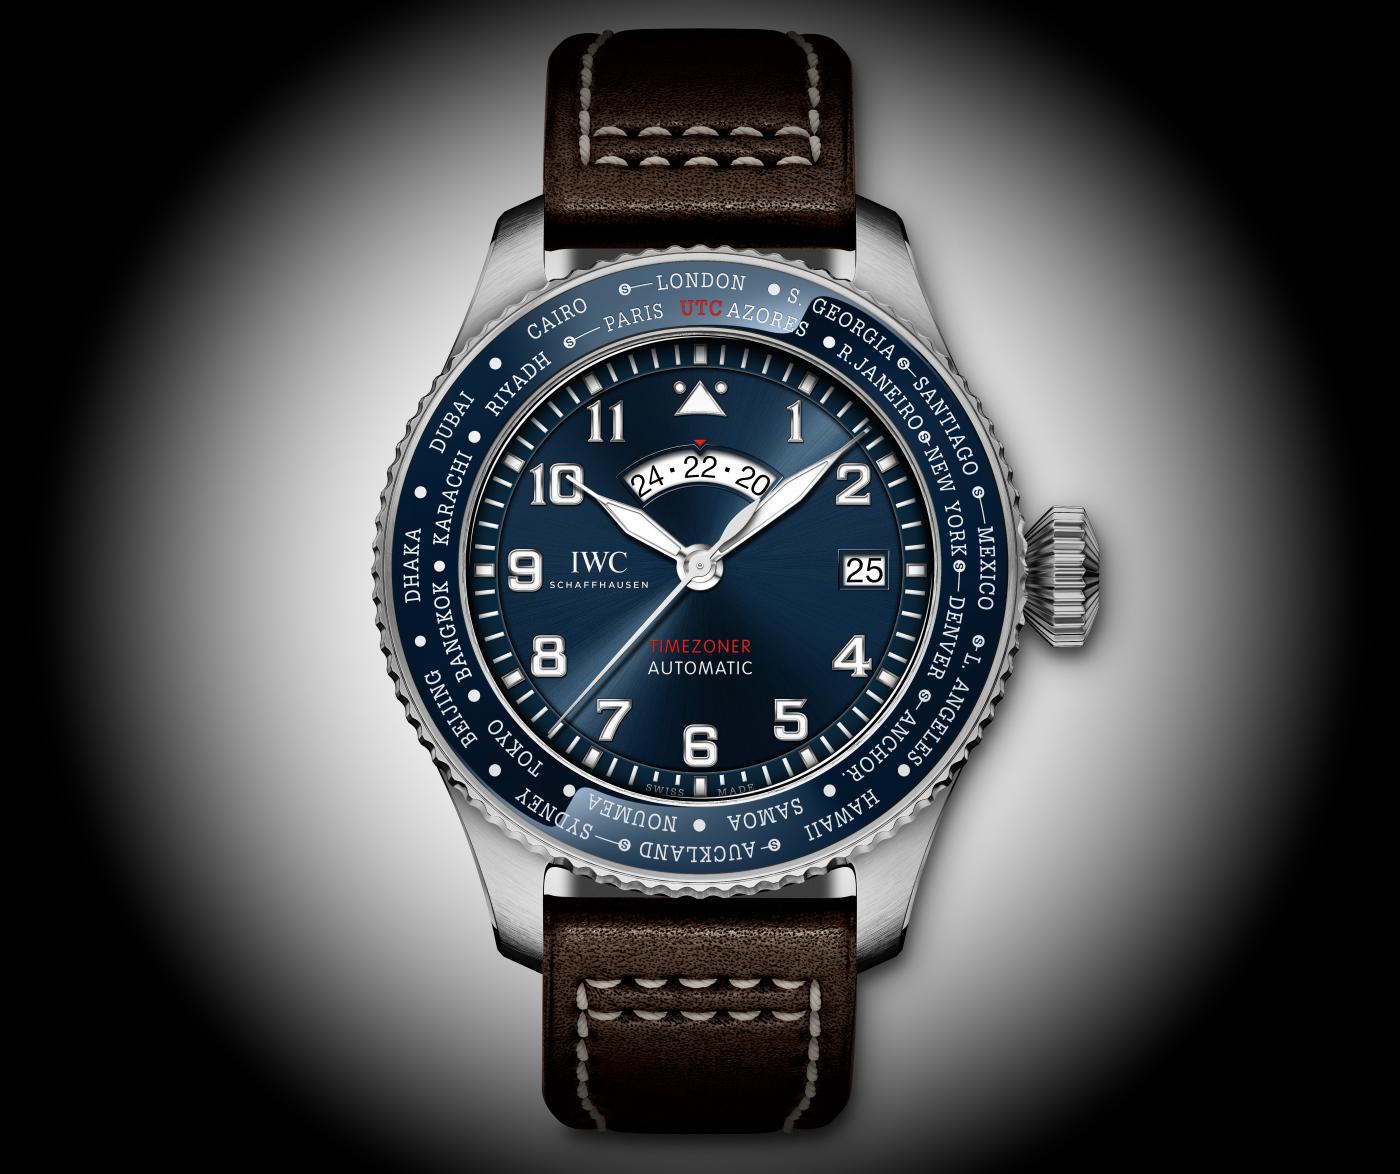 IWC_the_pilot_s_watch_timezoner_edition_le_petit_prince_-_europa_star_magazine_2021